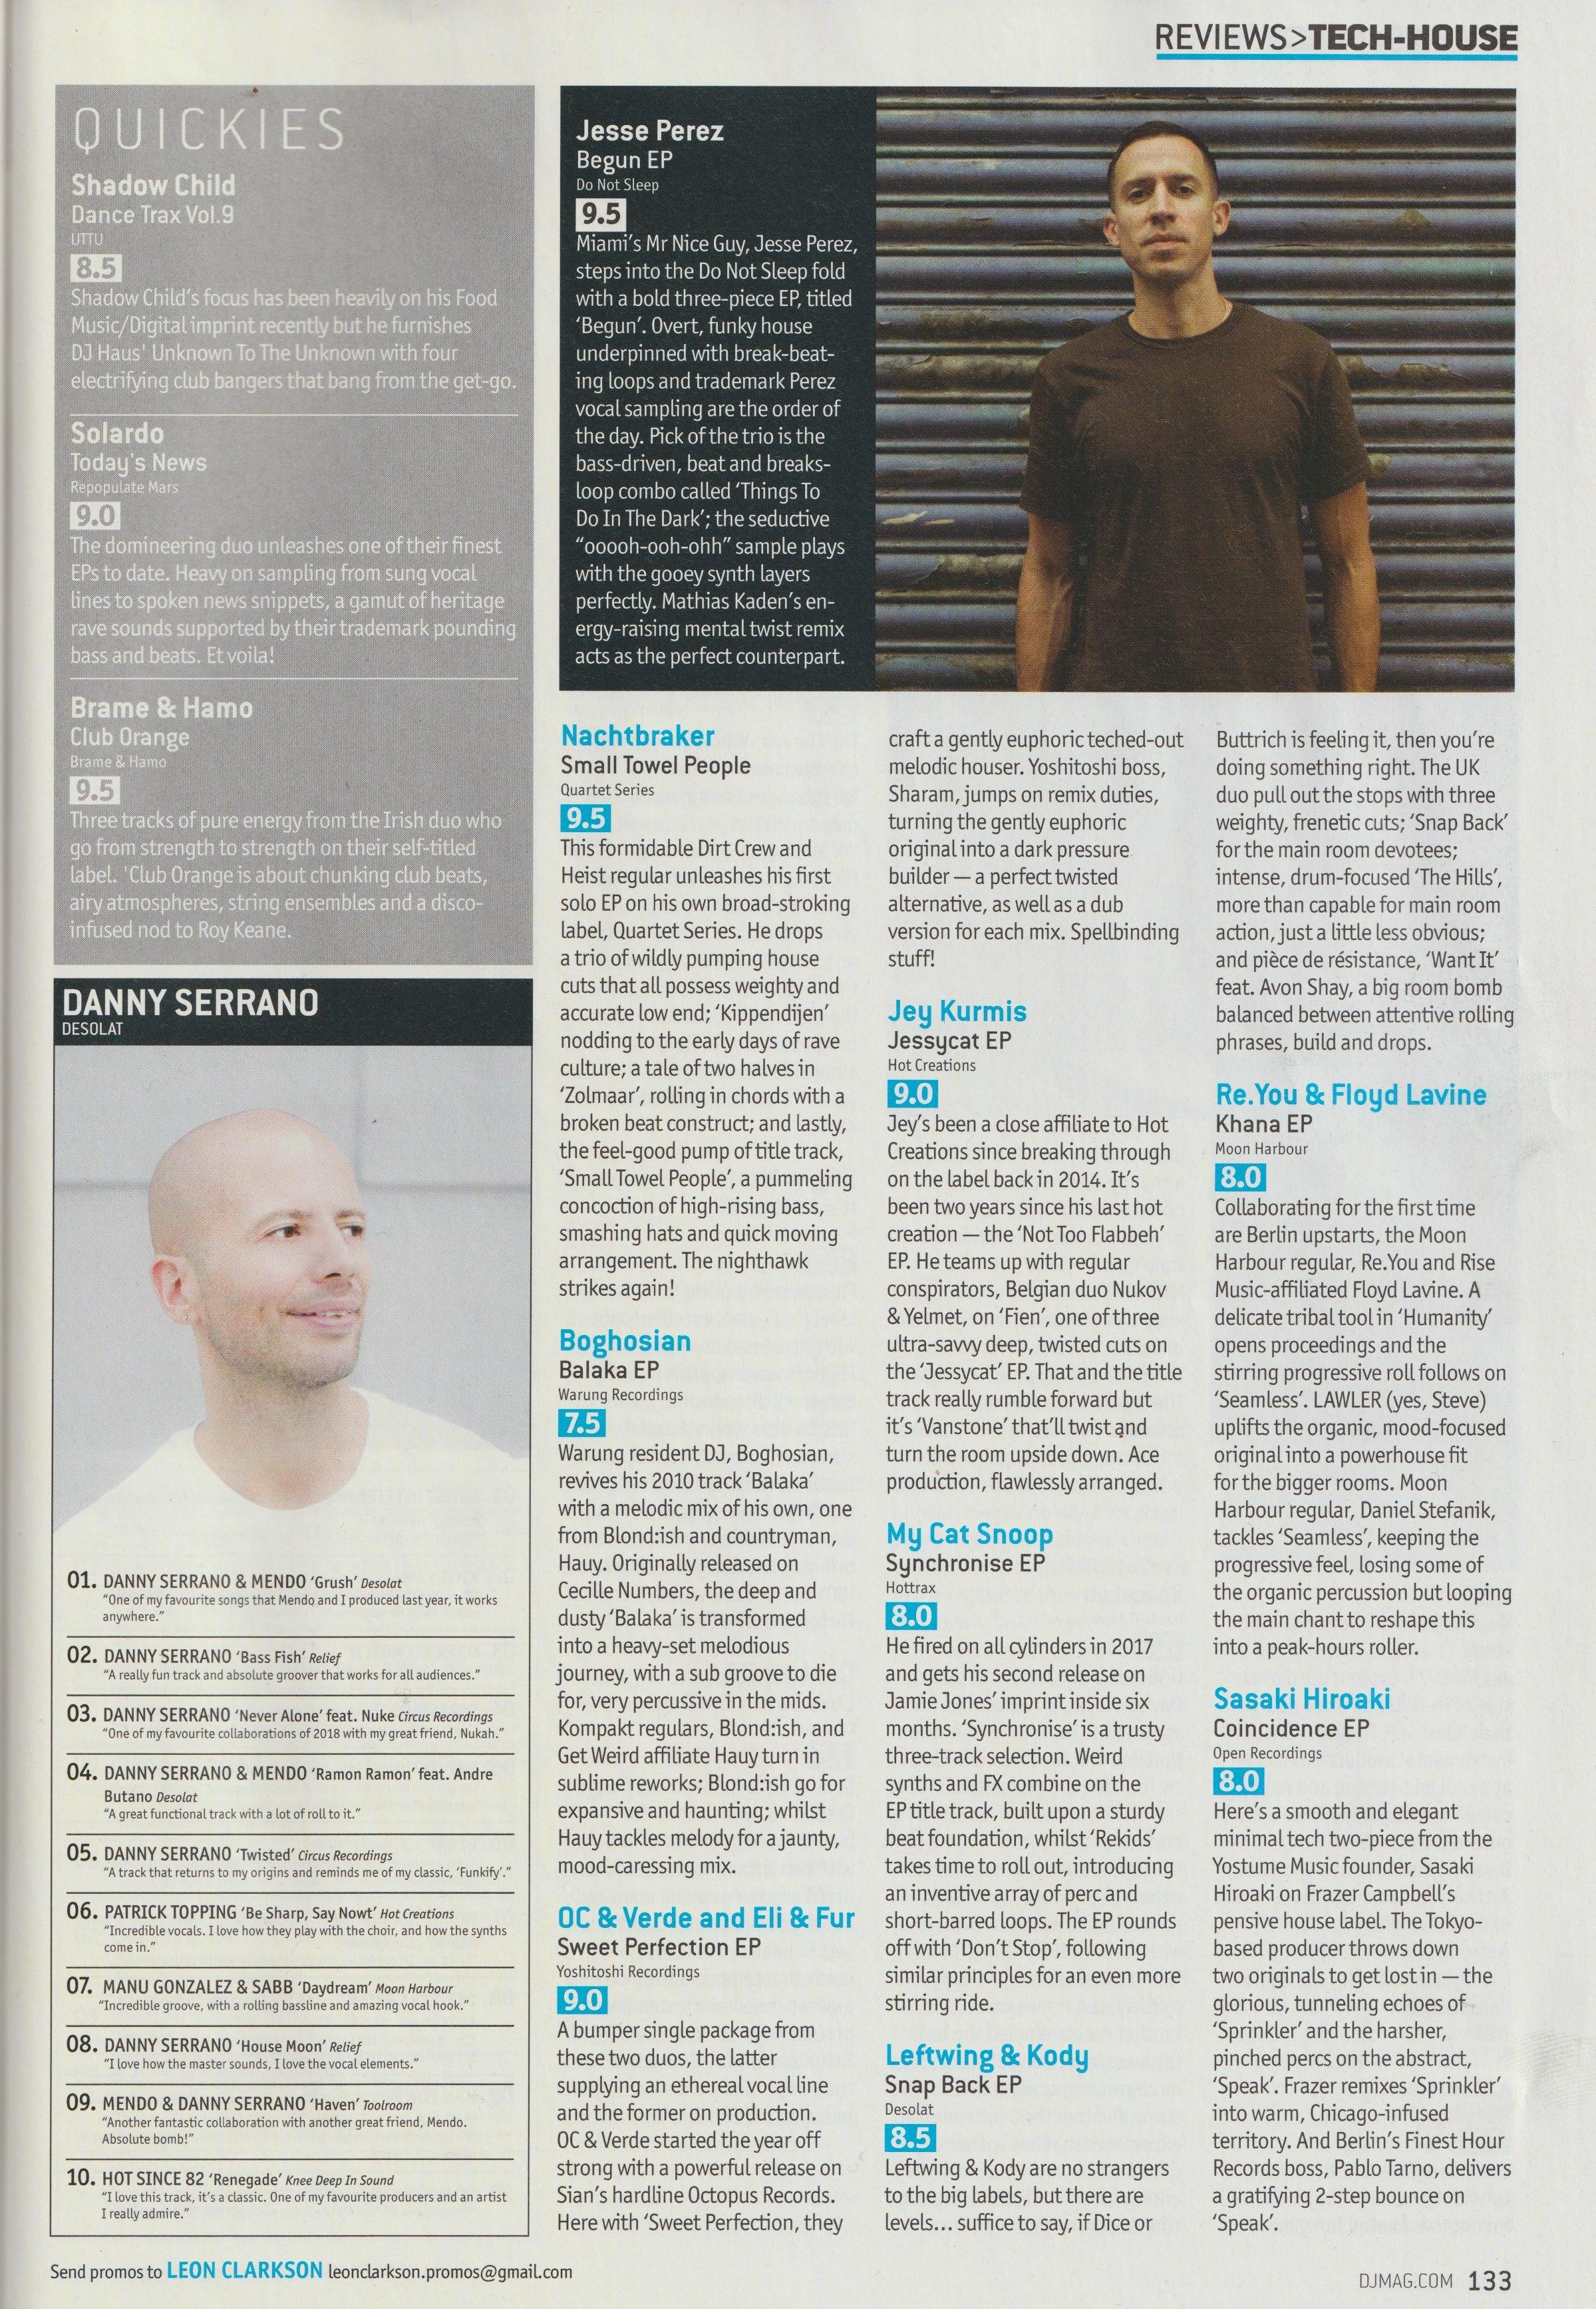 print magazine ep reviews - danny serrano top 10 chart and yoshitoshi 9/10 review on dj mag's uk tech house page